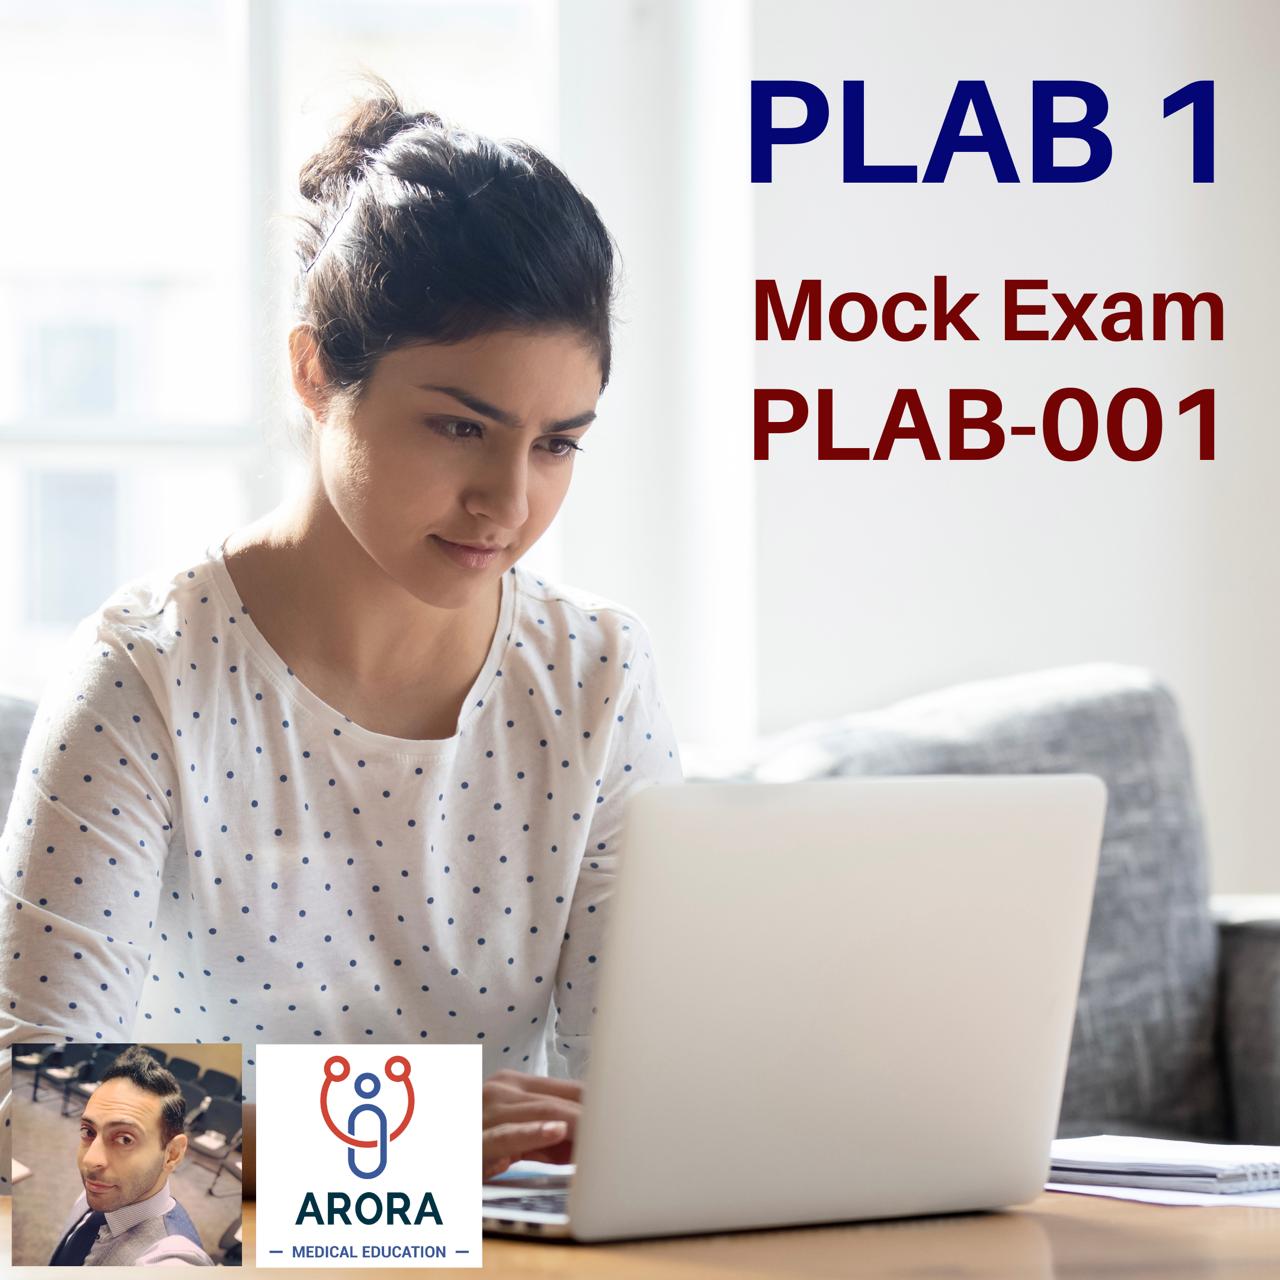 plab1 01 - MRCGP CSA, AKT and PLAB Exam Courses and Online Webinars - Arora Medical Education